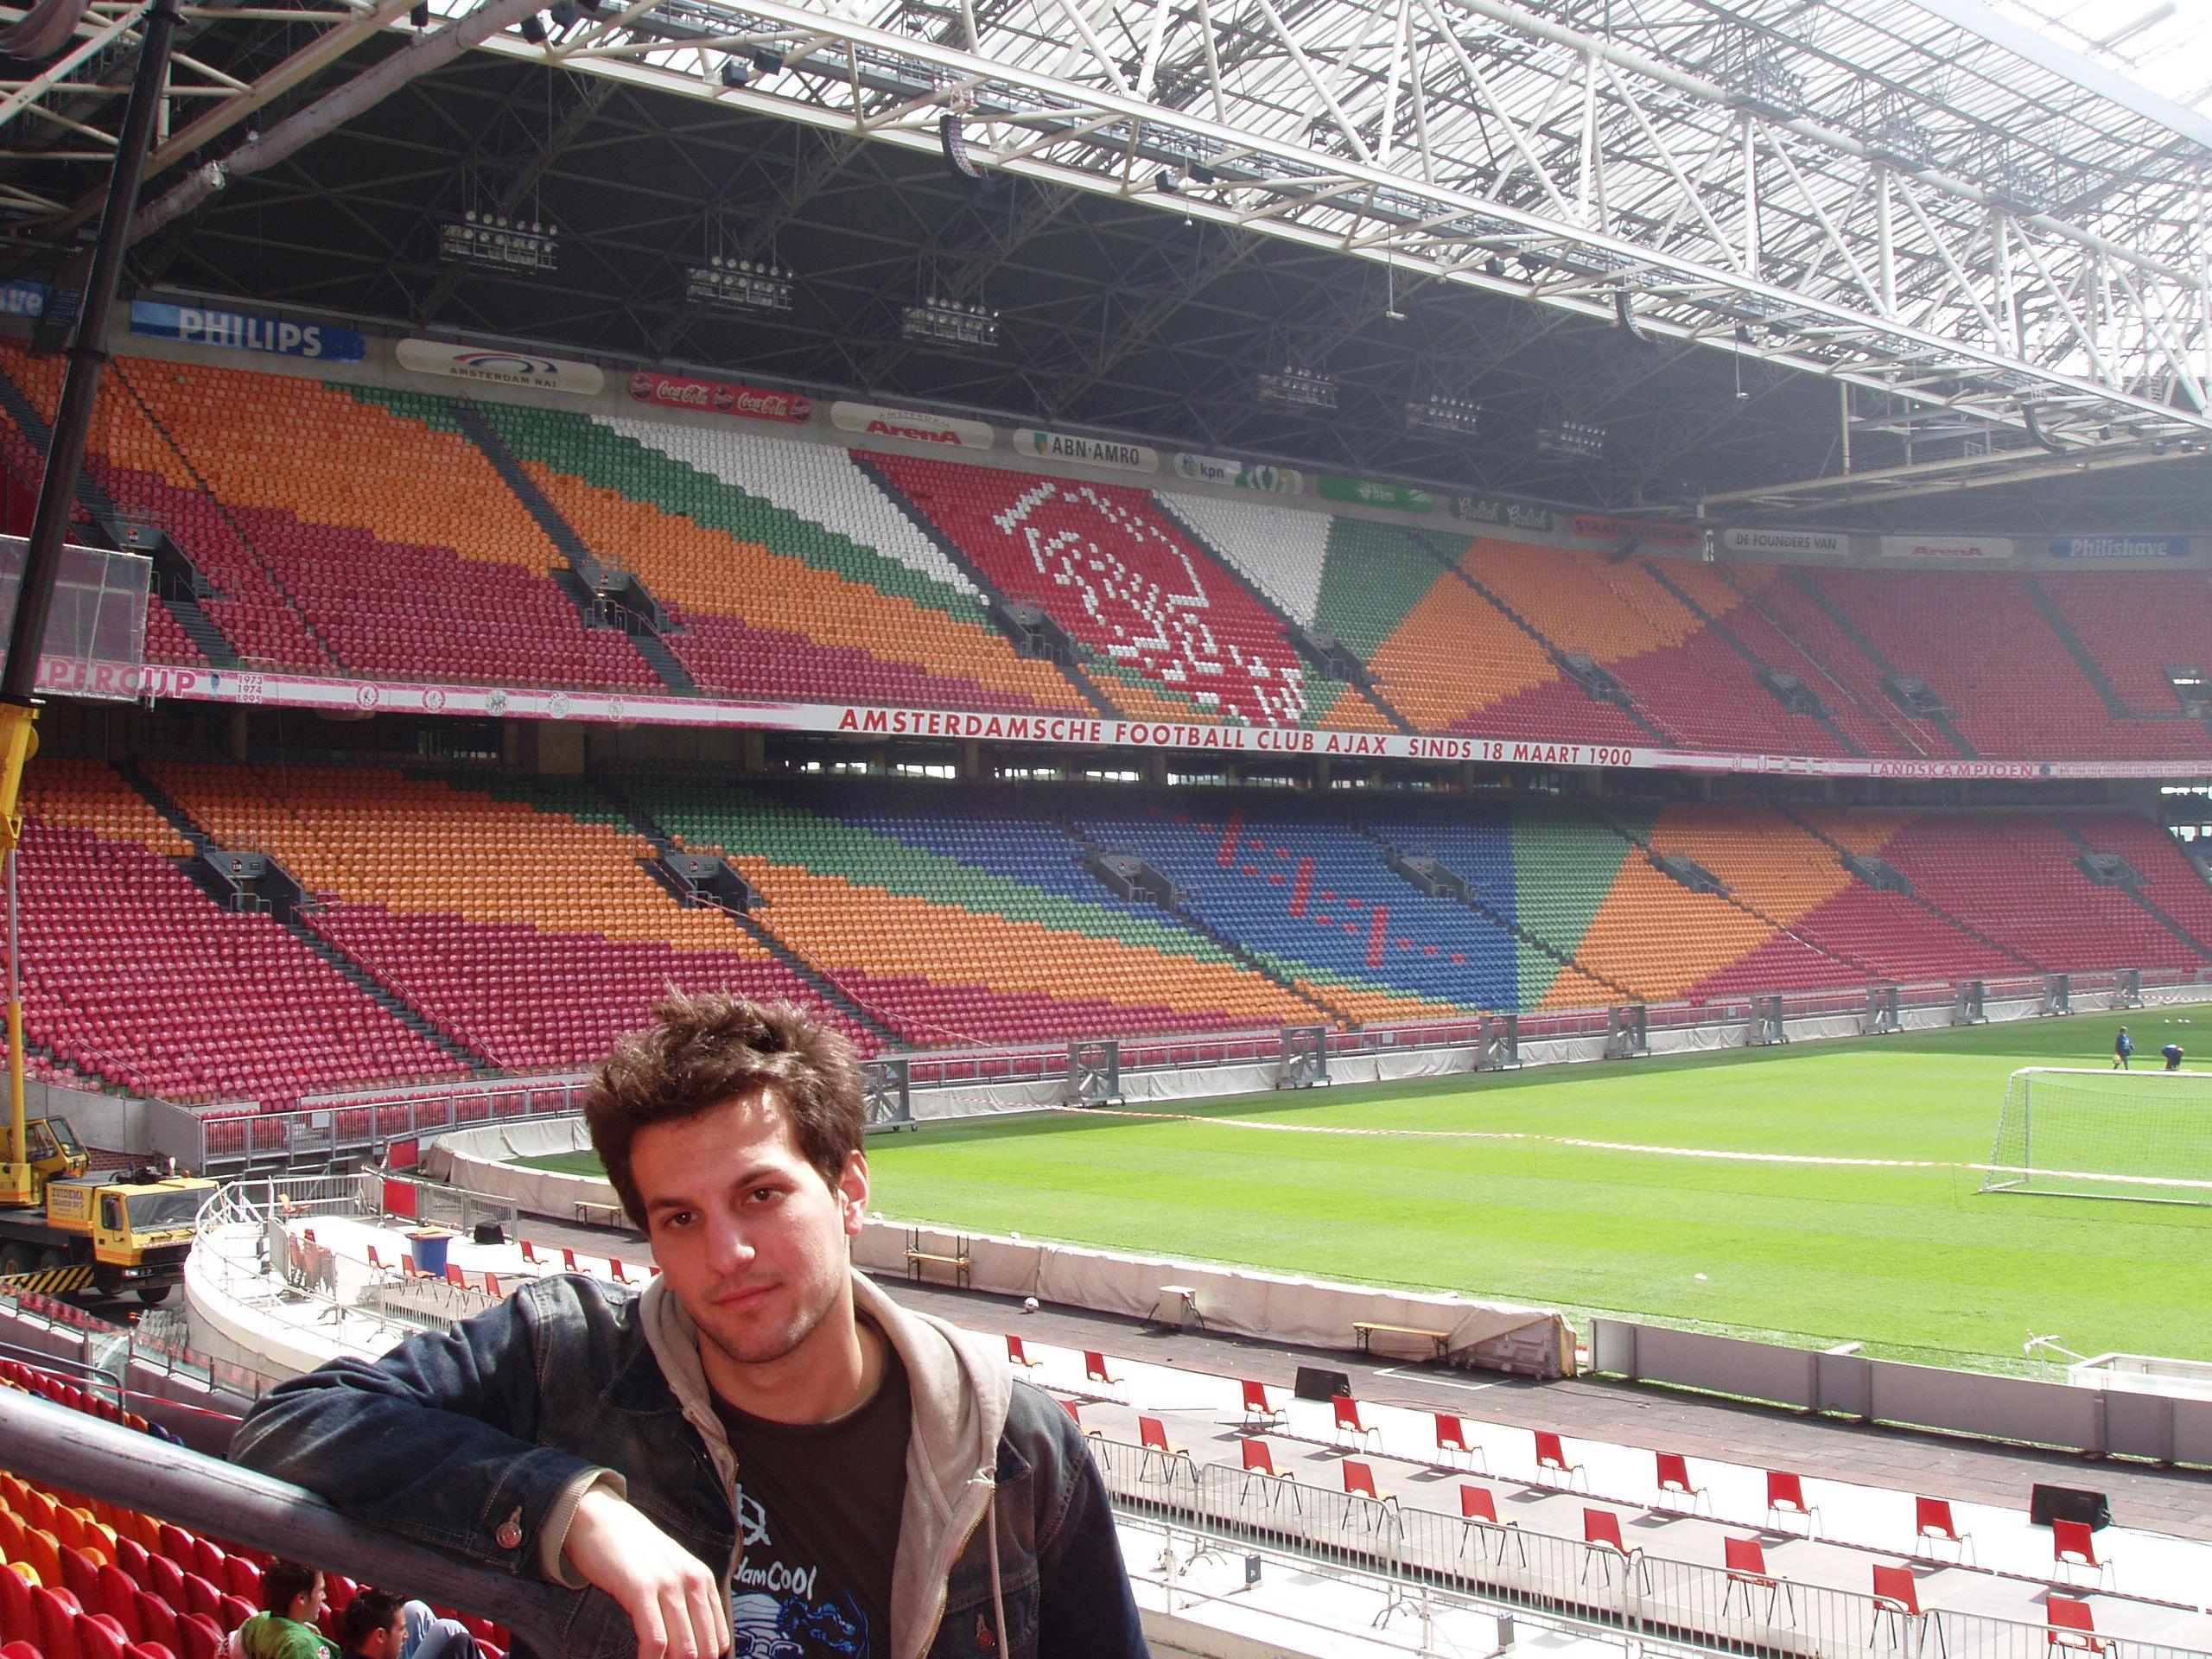 amsterdam arena (94)